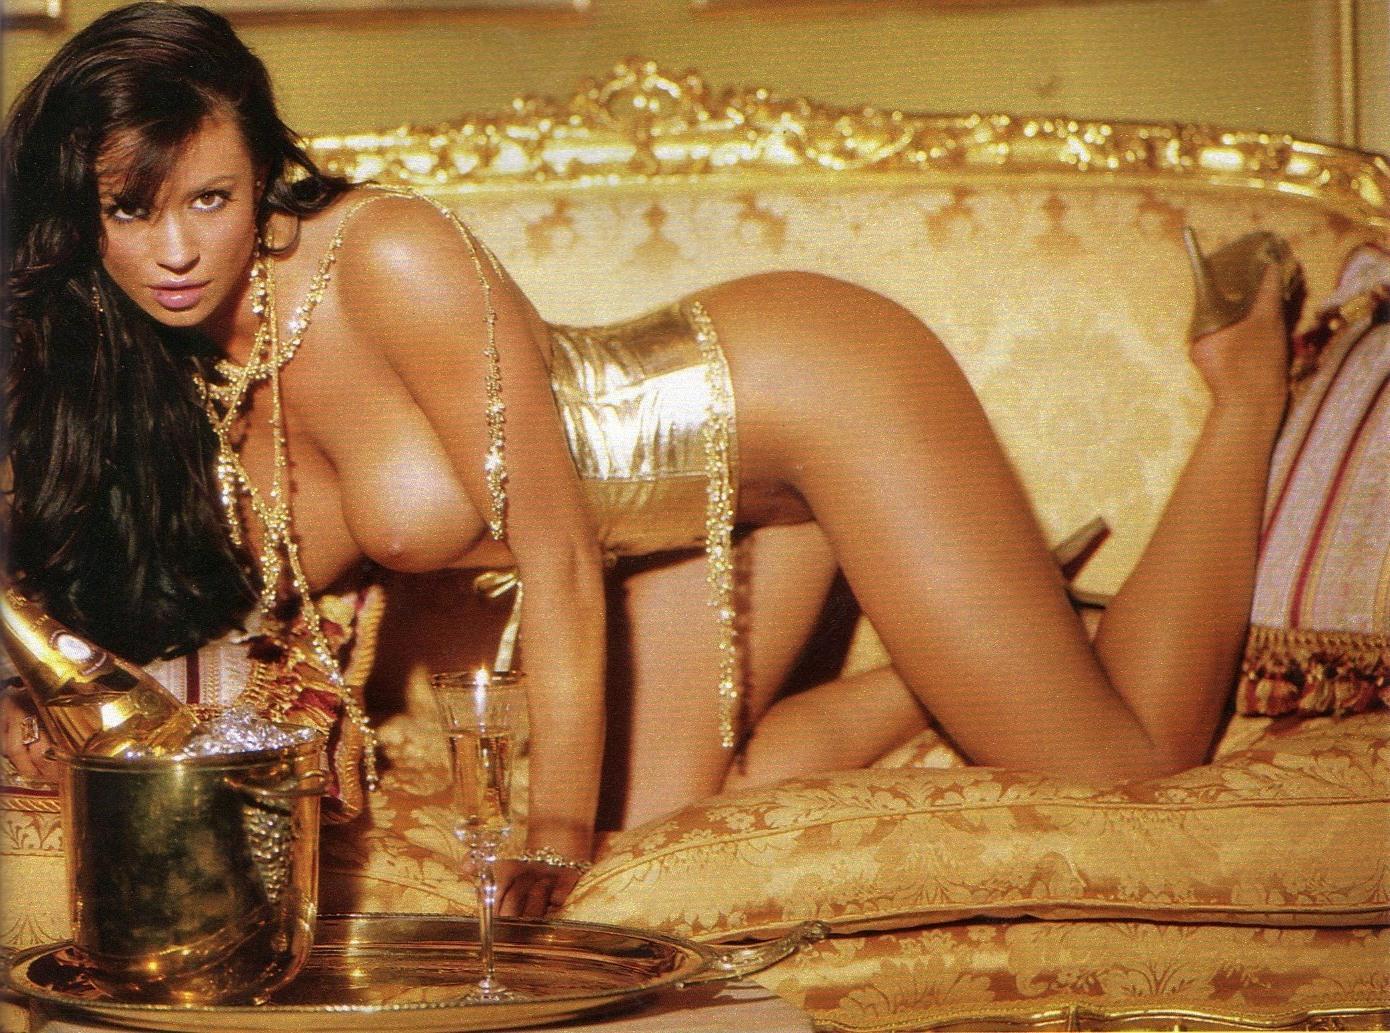 Trish Stratus Nude - Hot Pics - Naked -